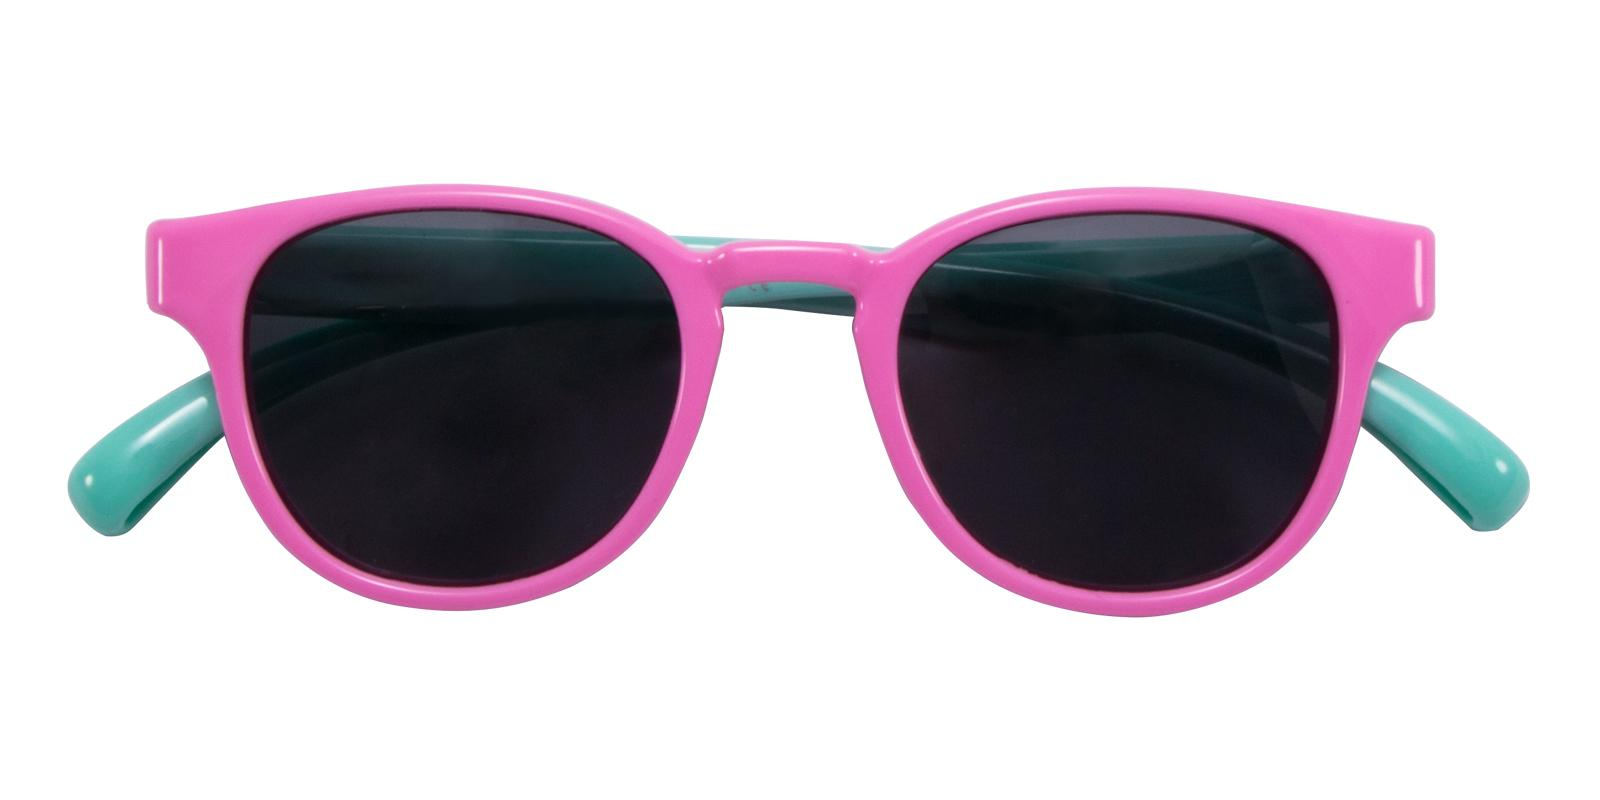 Dainty Pink TR Sunglasses , UniversalBridgeFit Frames from ABBE Glasses